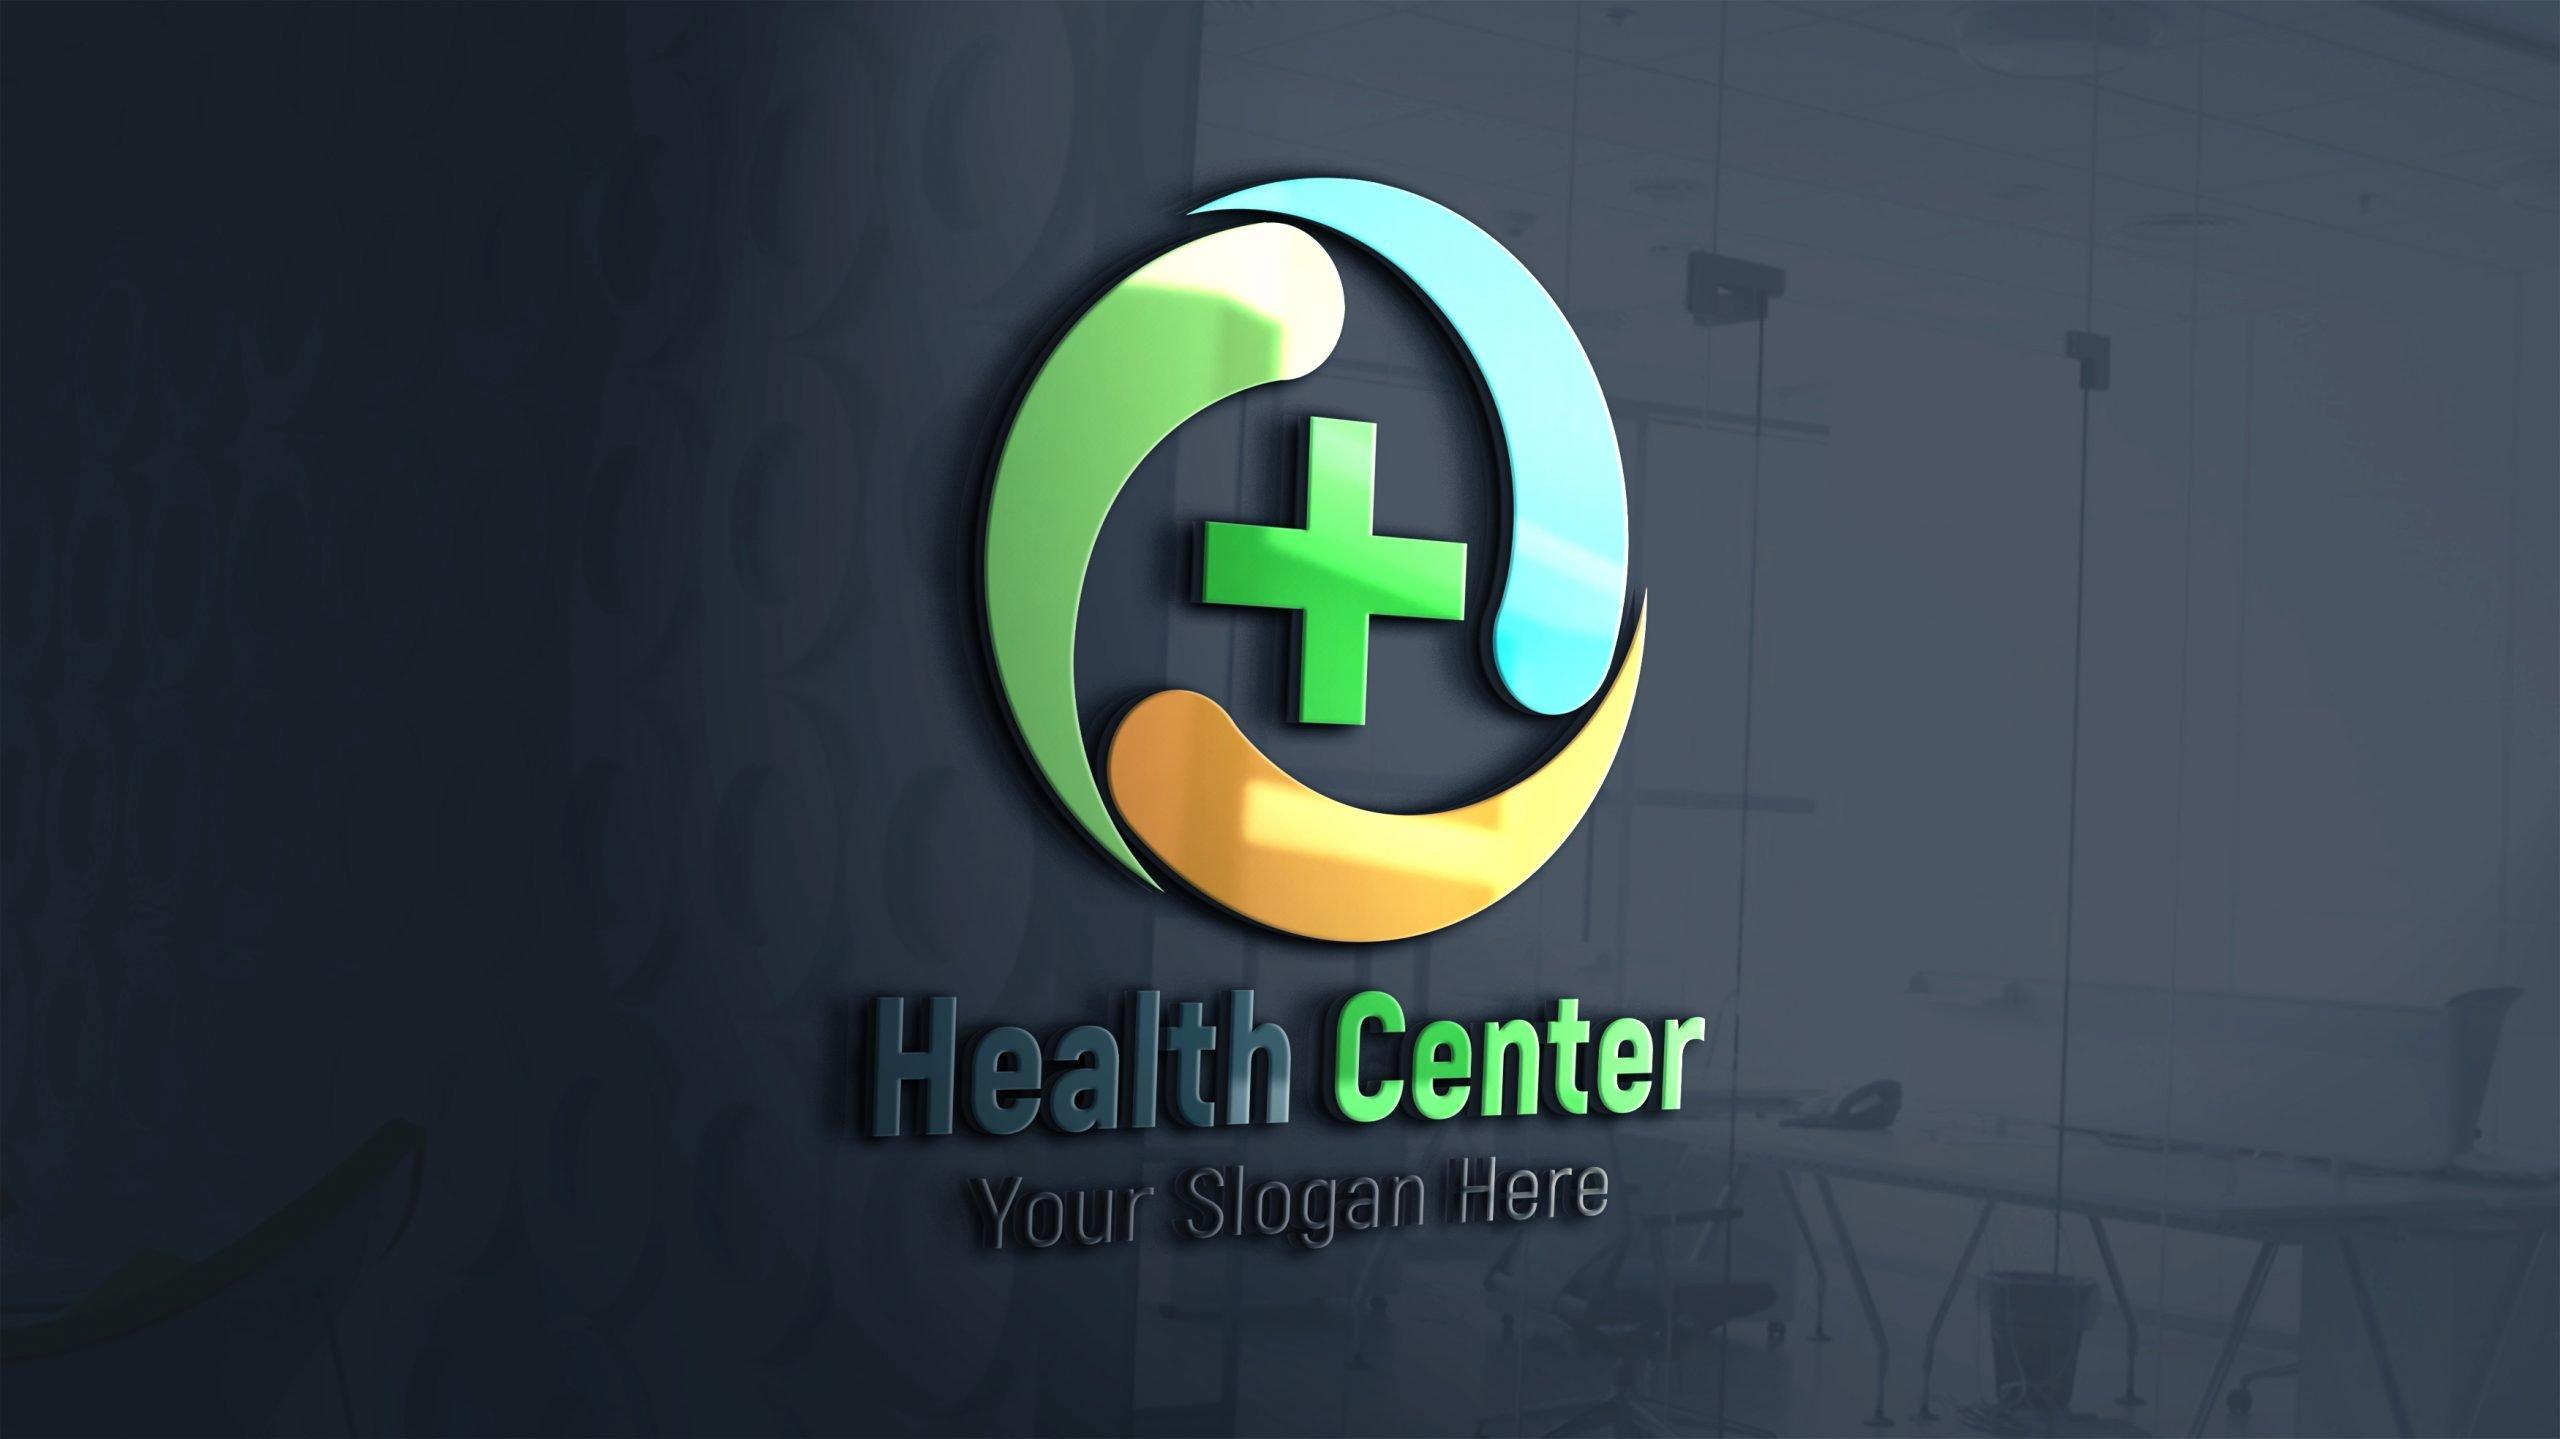 Health care medical logo Design 3d glass window